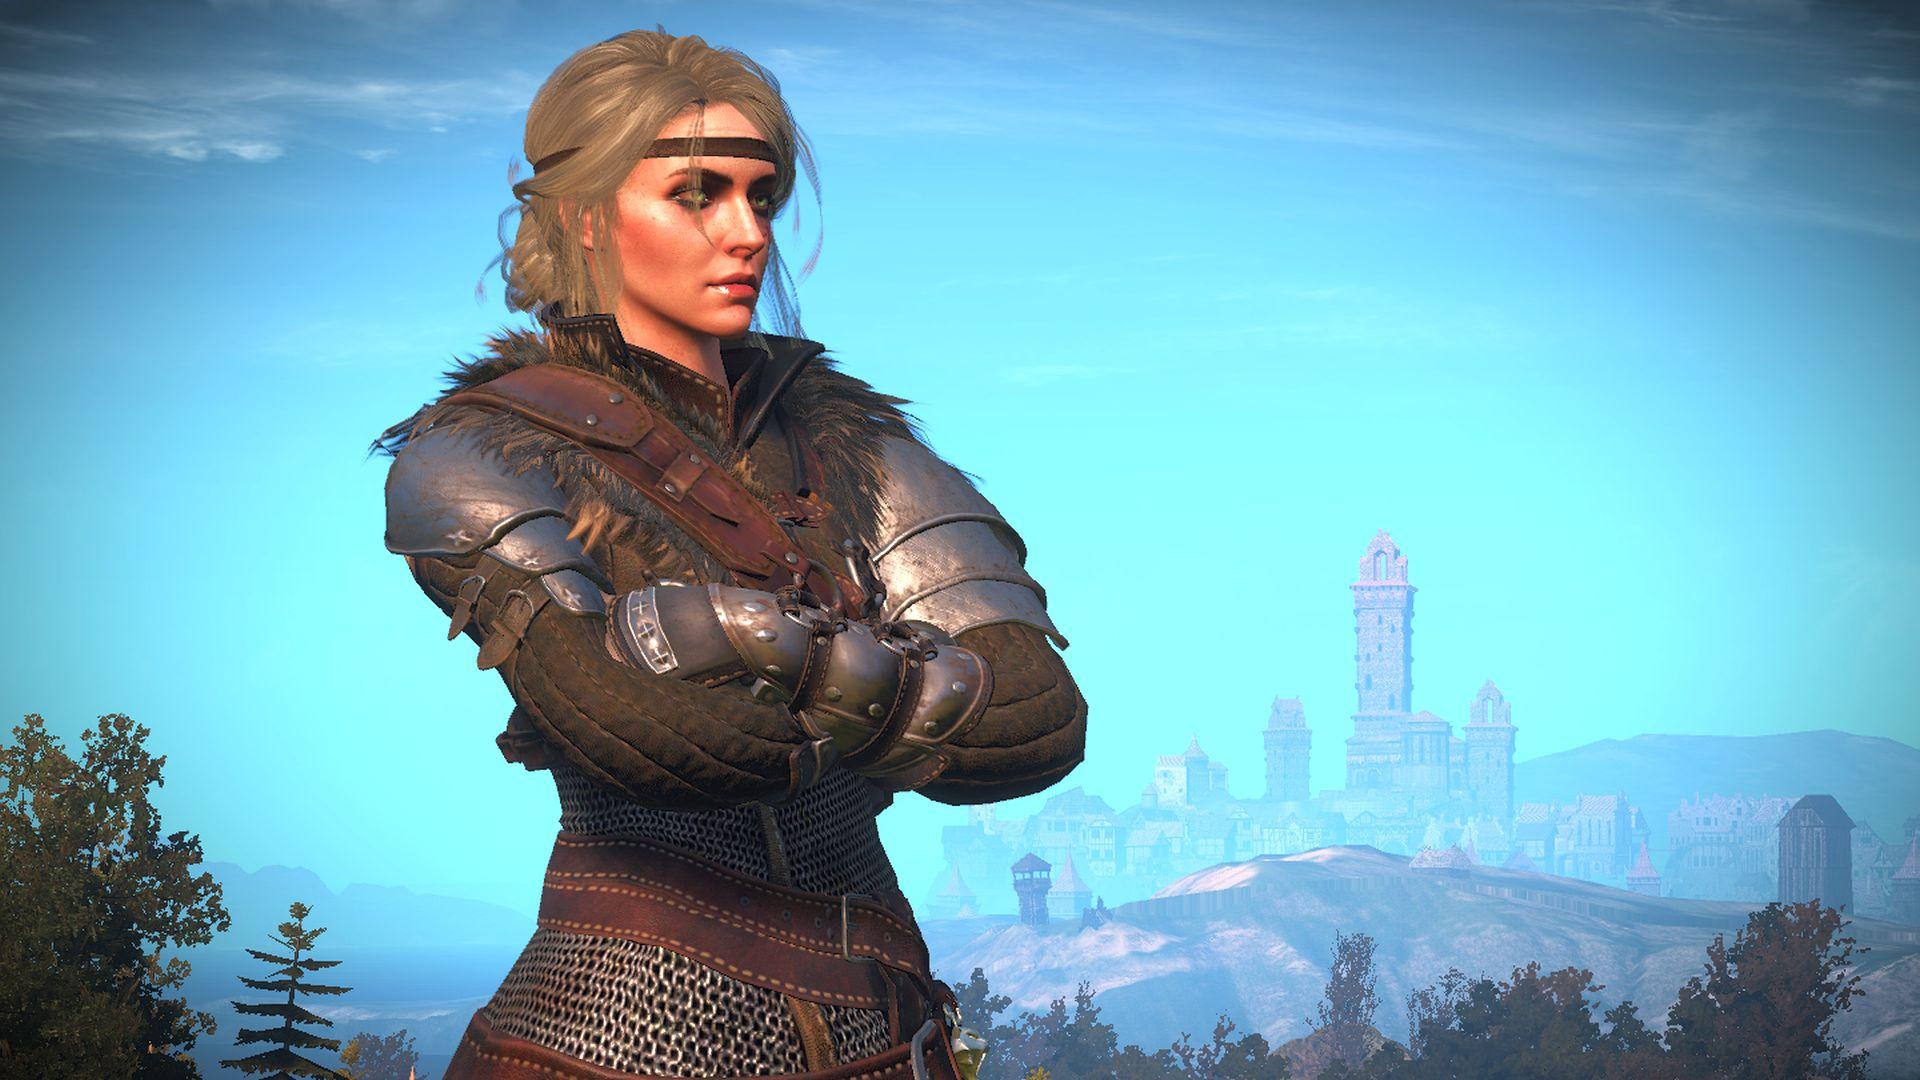 This Witcher 3 mod gives Ciri Geralt's best armour